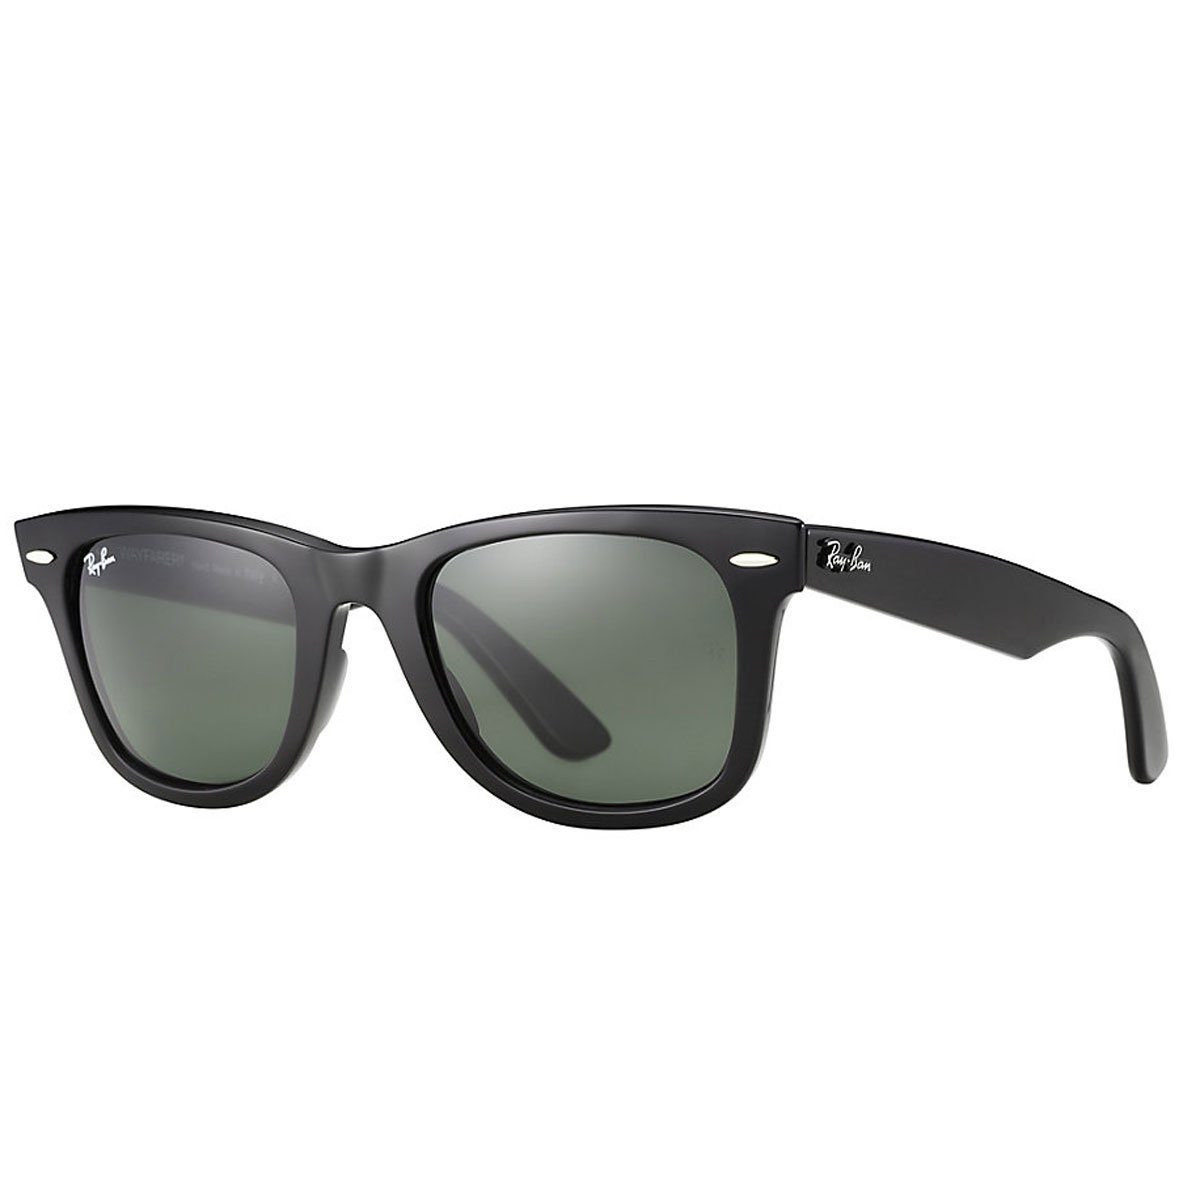 Ray-Ban 0RB2140 Original Wayfarer Sunglasses, Black, 54mm